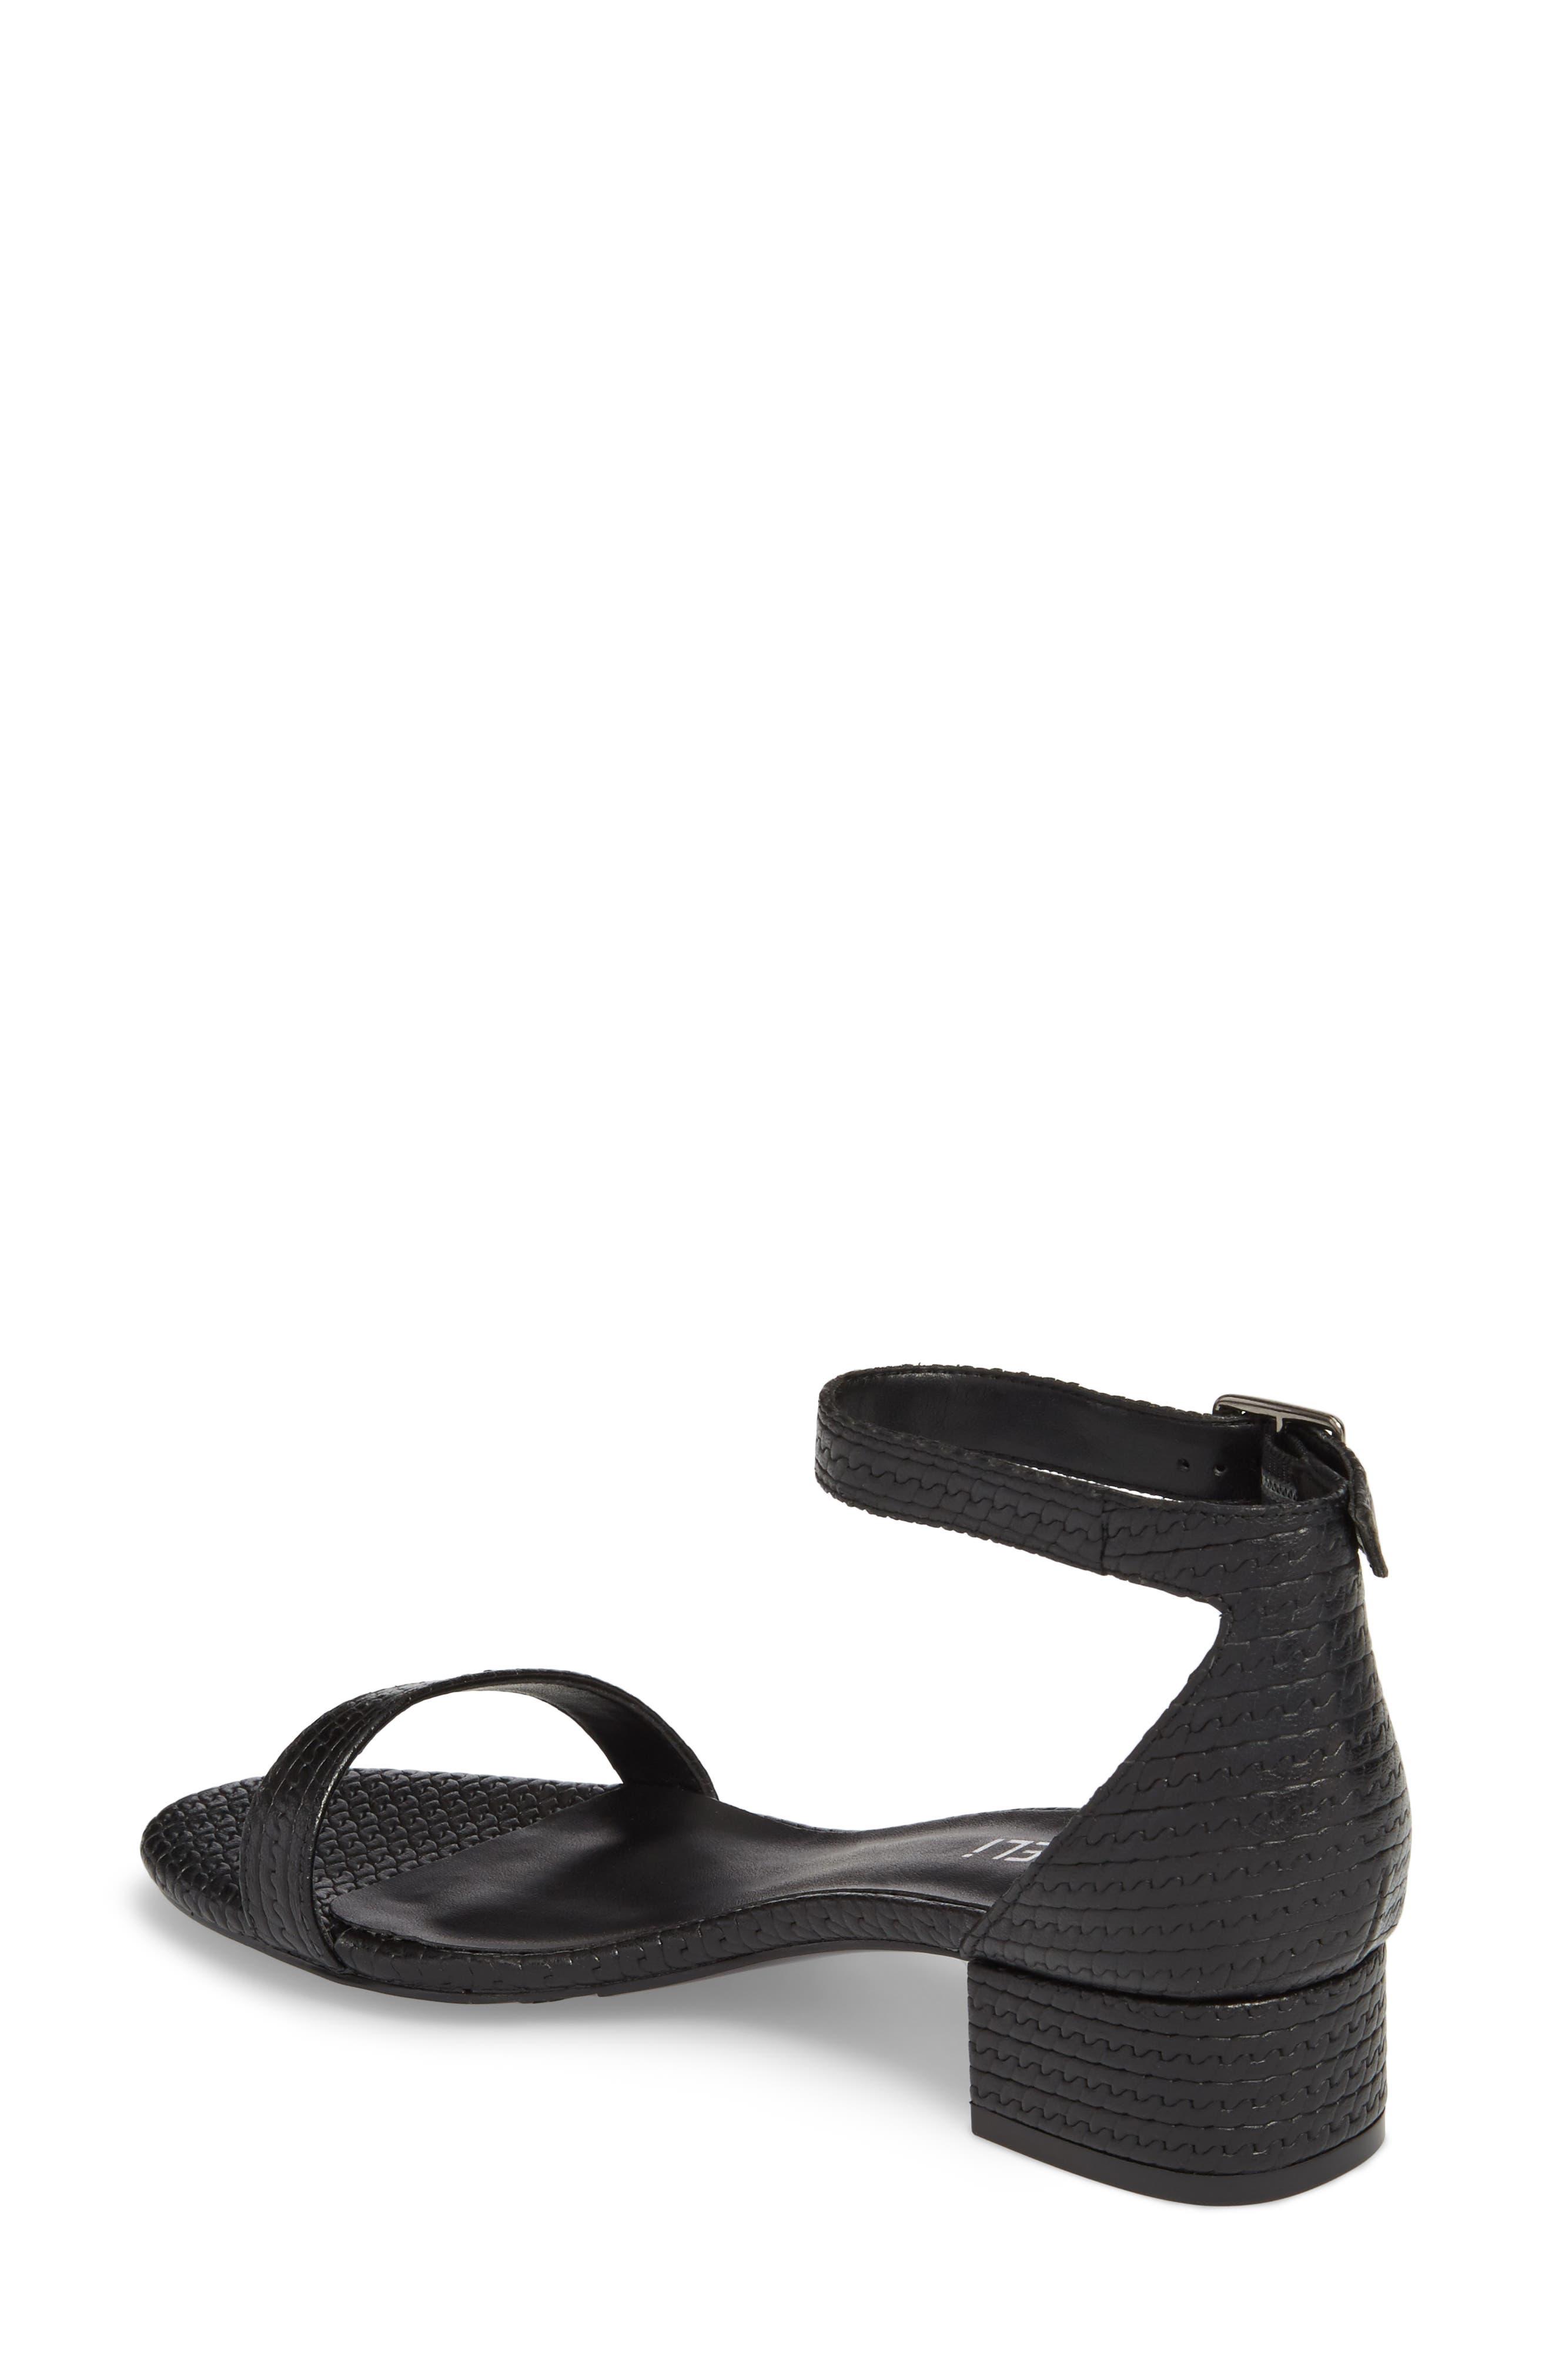 Hirin Sandal,                             Alternate thumbnail 2, color,                             Black Printed Leather